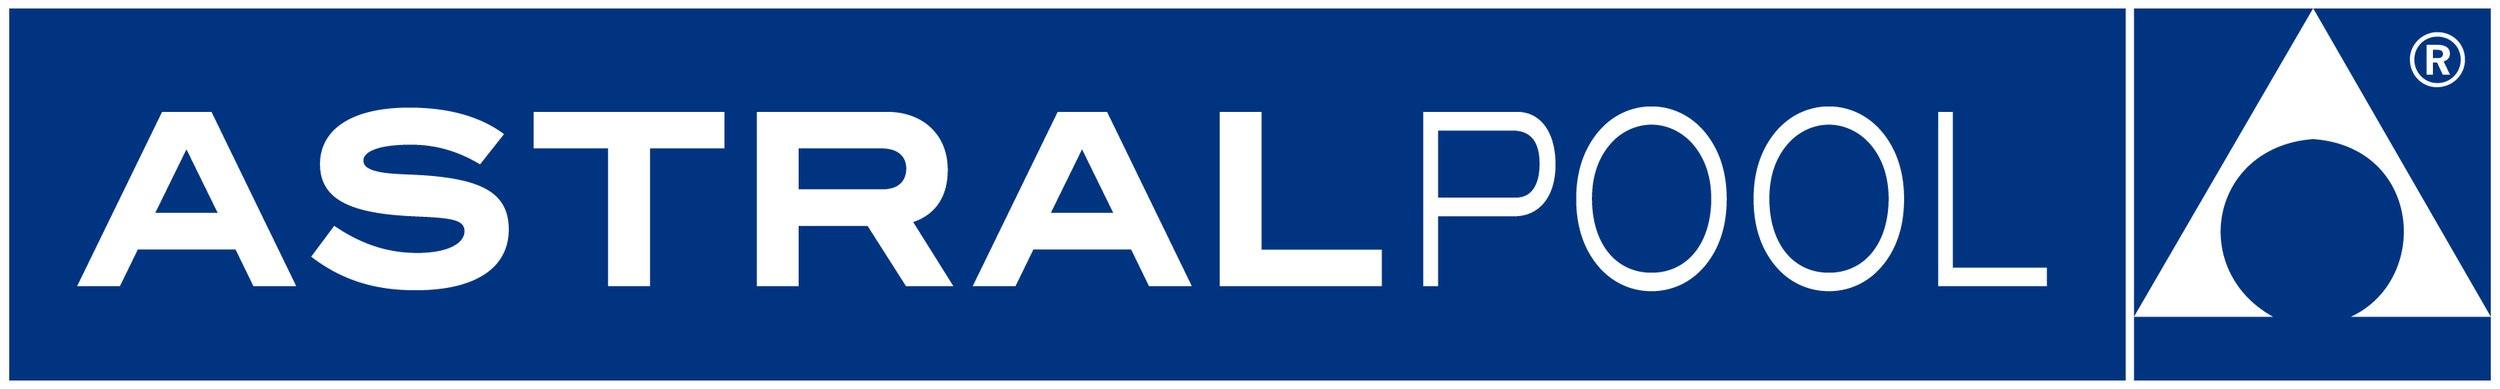 AstralPool-Logo-high.jpg